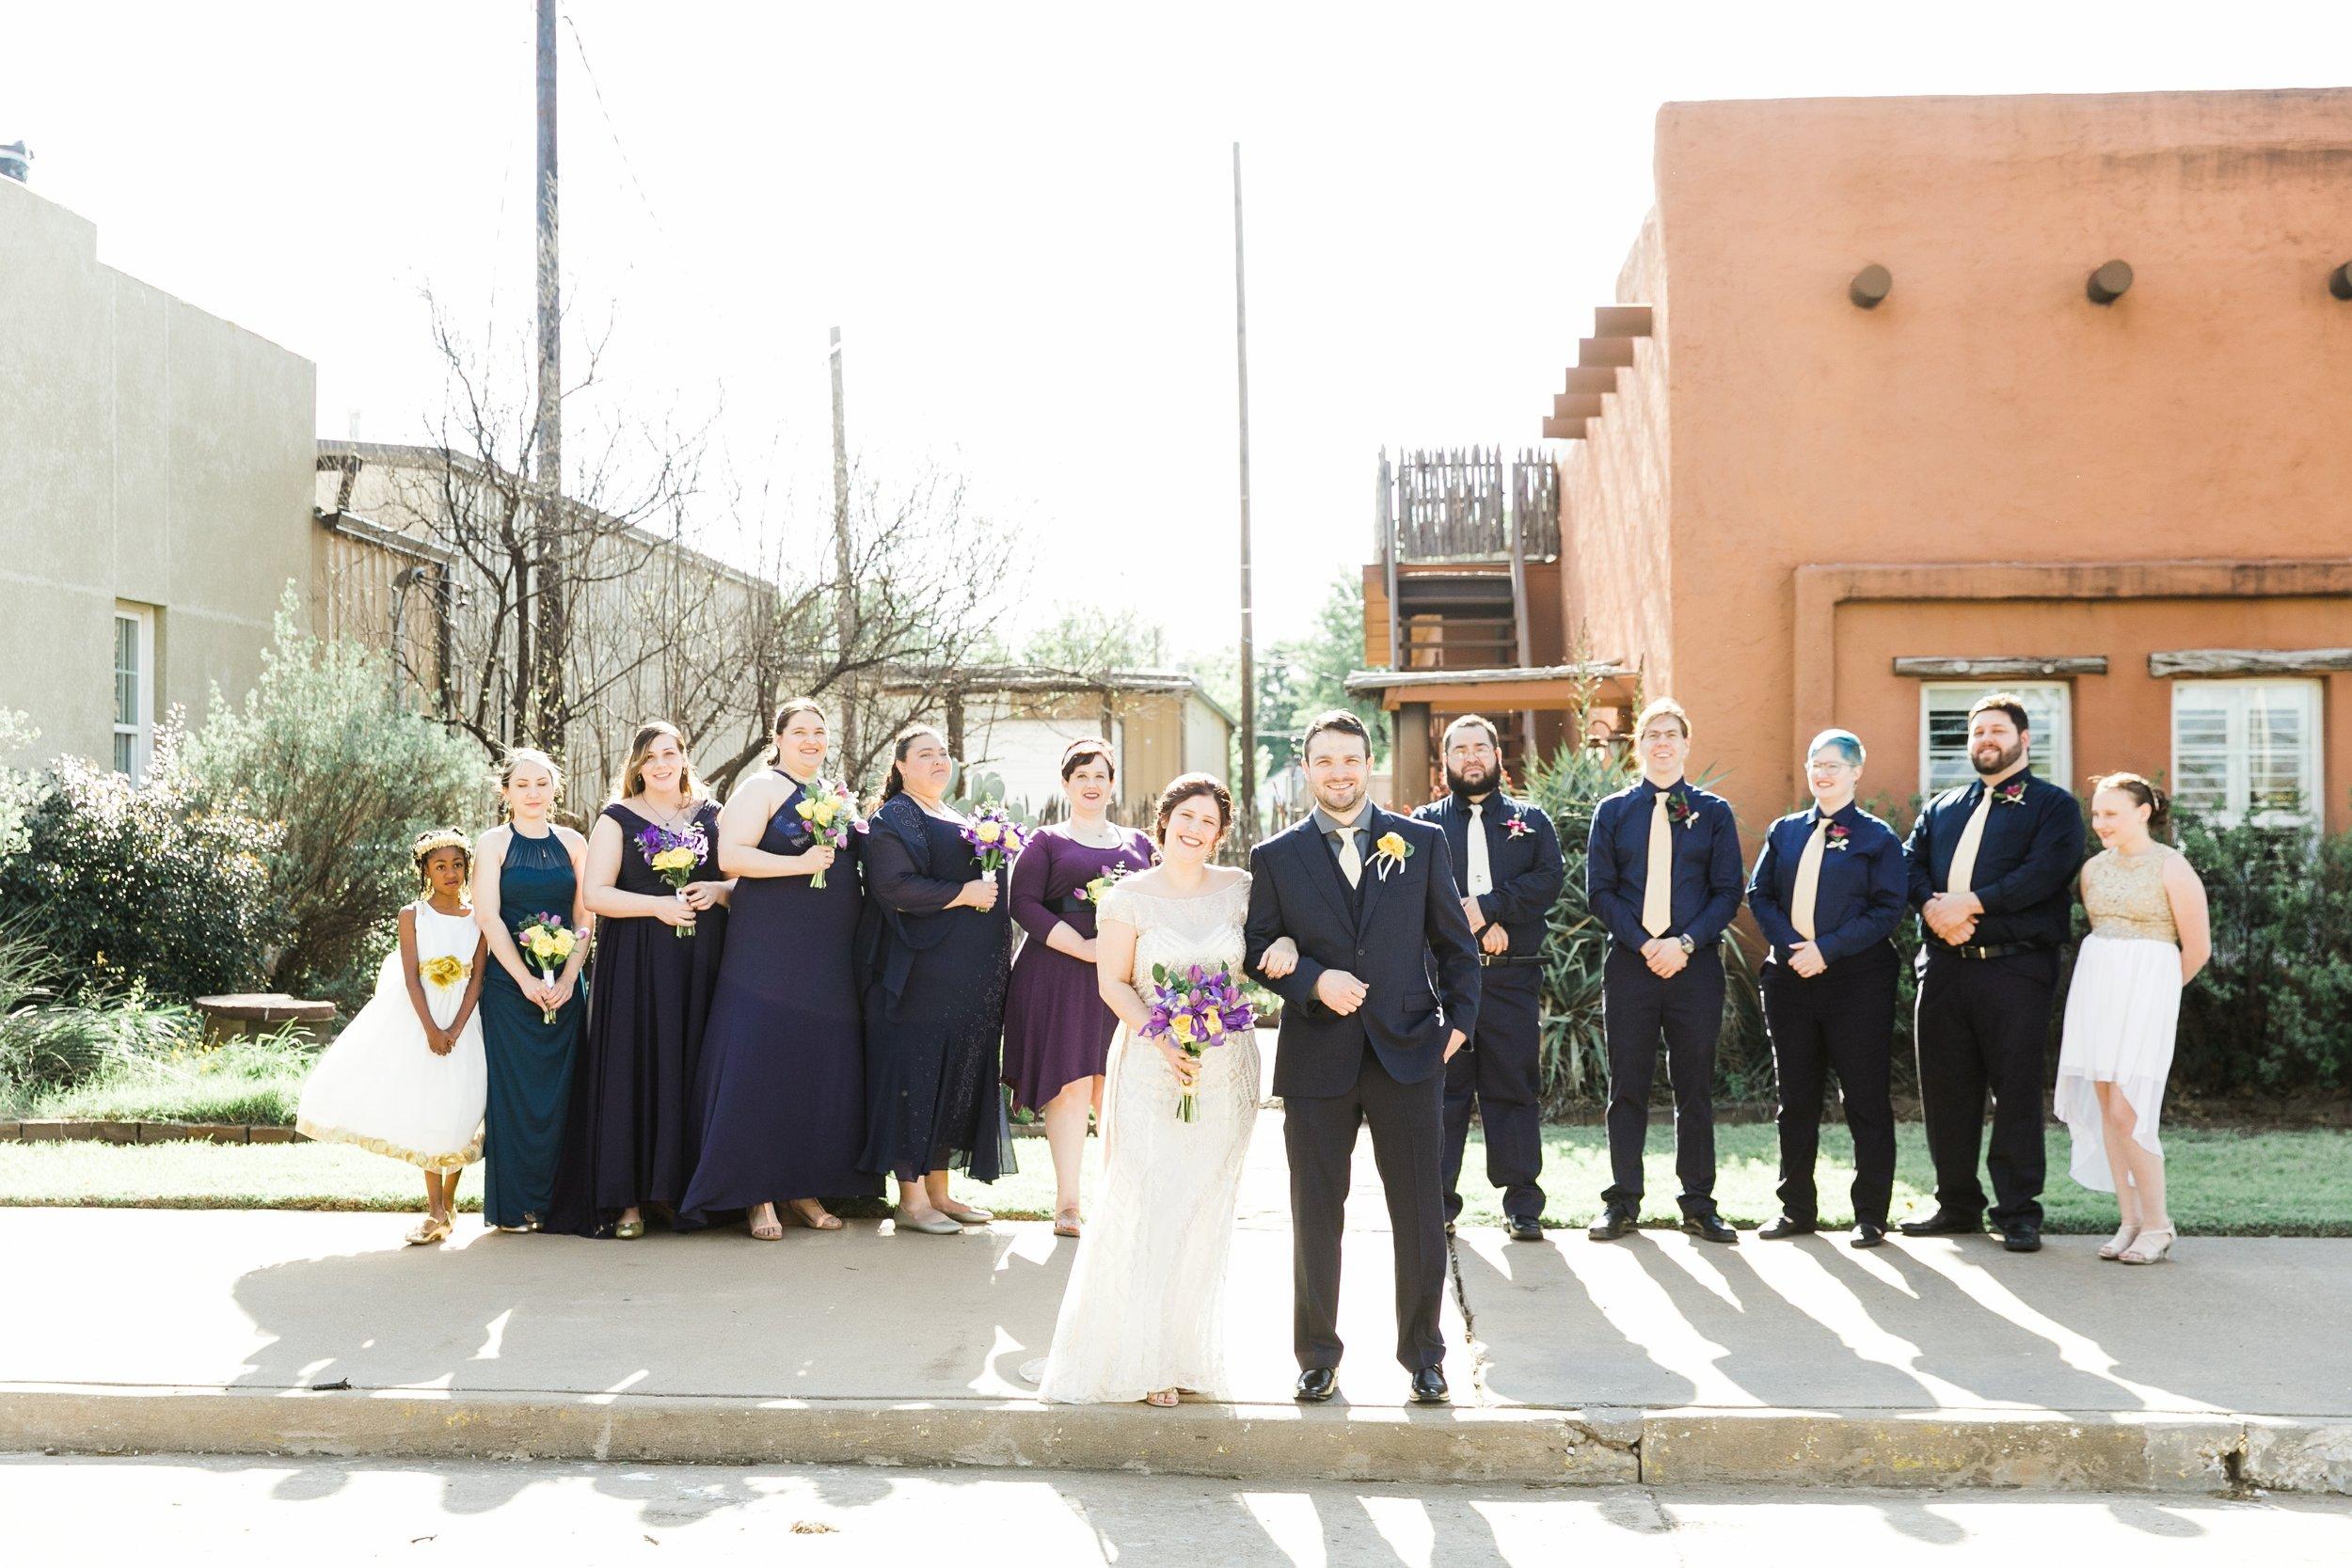 the-rock-barn-henrietta-wedding-photographer-texas-wichita-falls-earth-day-wedding-017.jpg